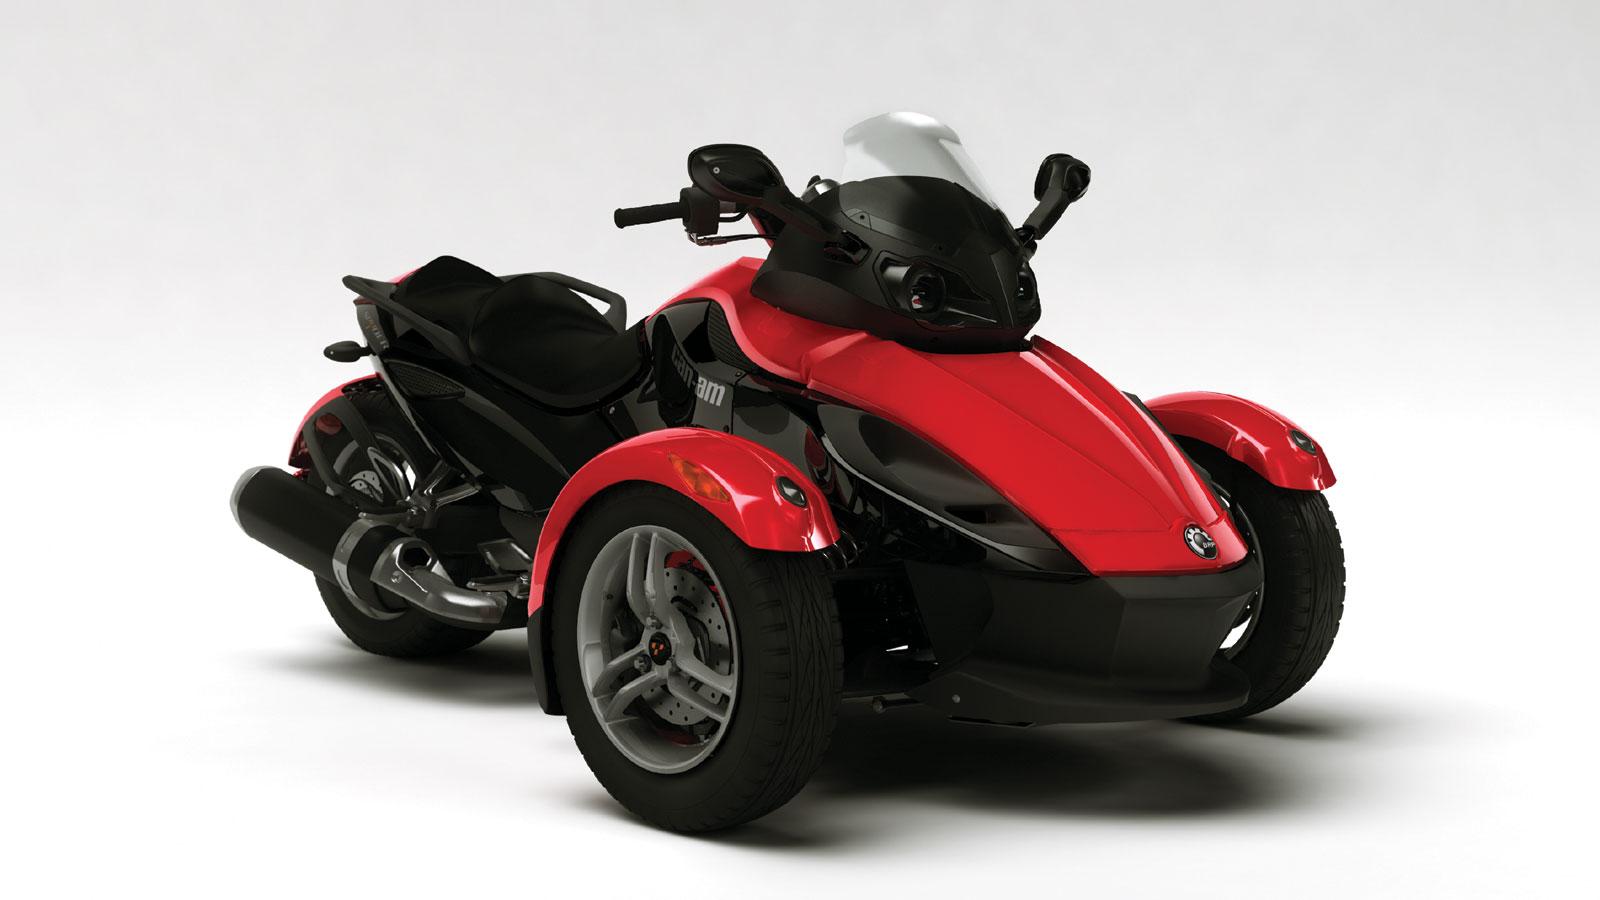 Roadster Can-Am Spyder, imagen 1 de 3, galería de Can-Am BRP Spyder ...